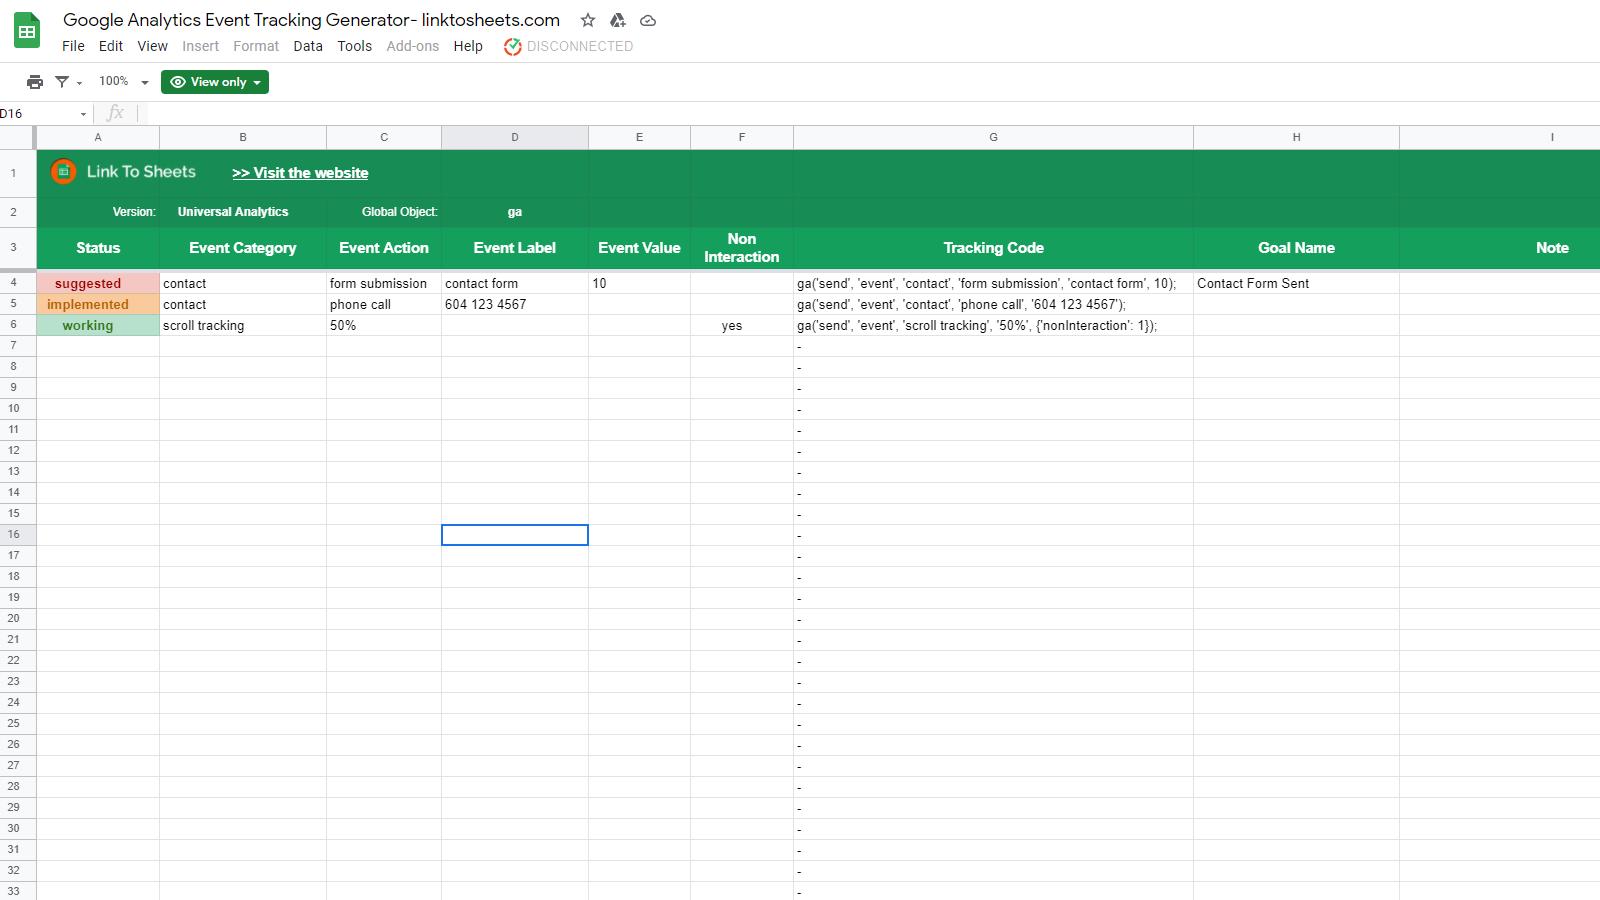 Google Analytics Event Tracking Generator